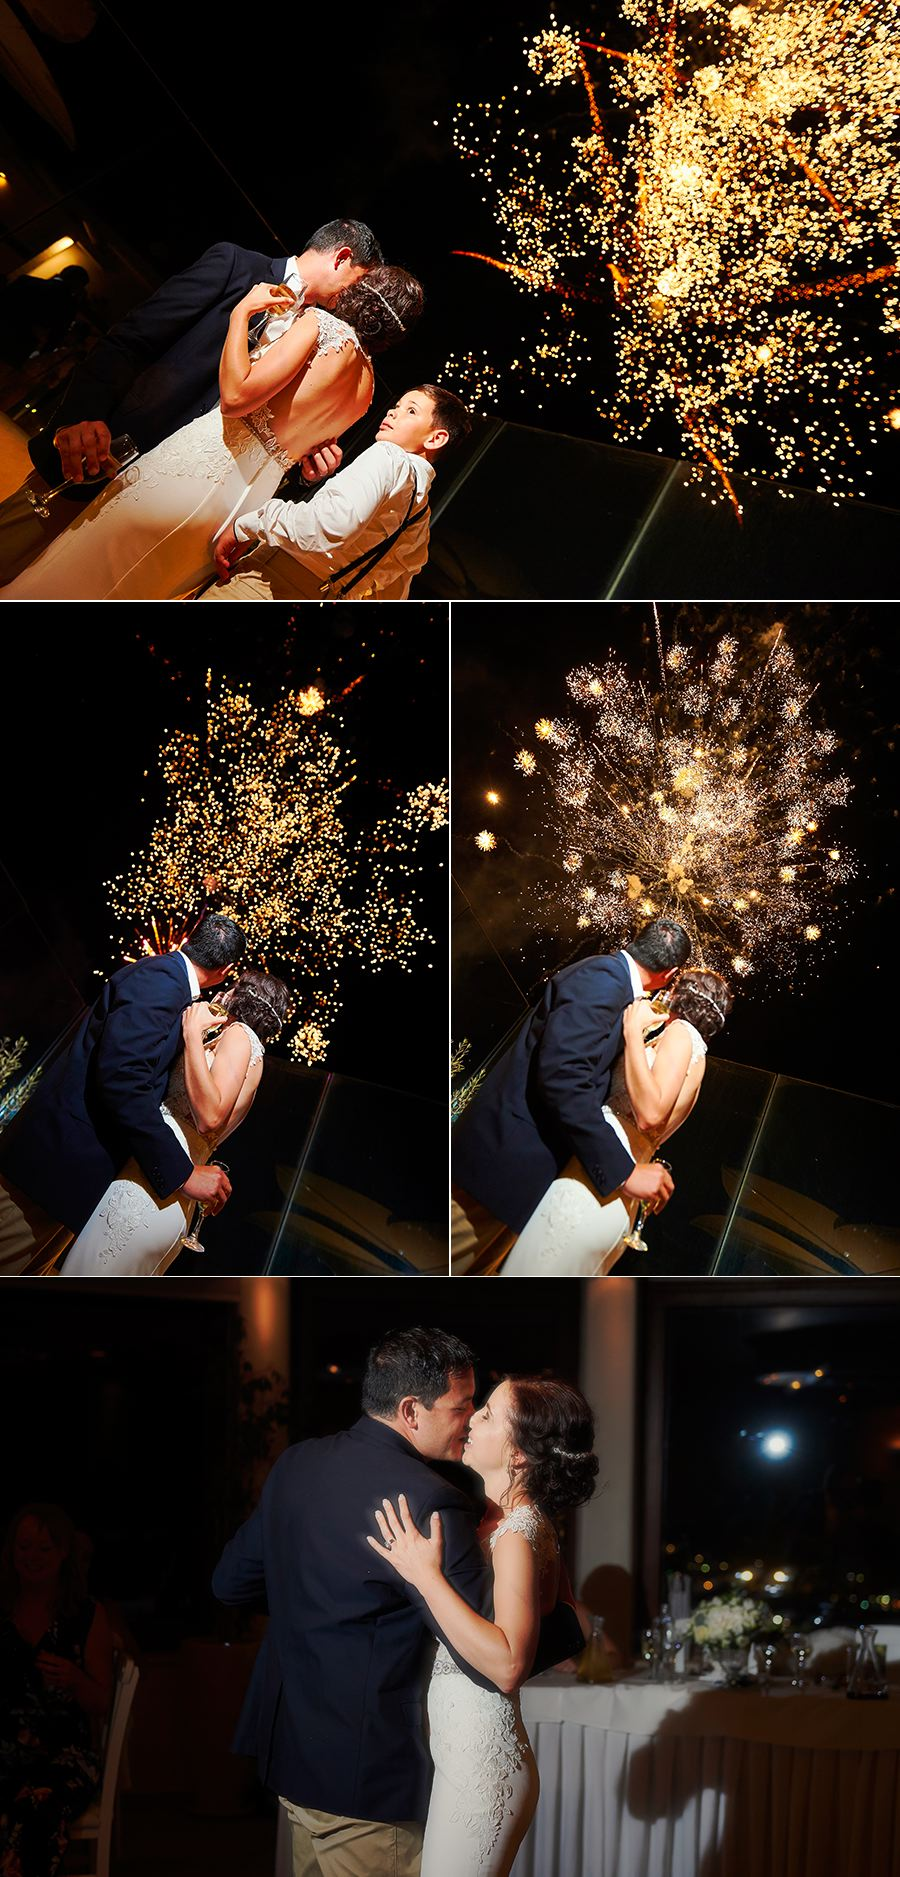 paul-simone-wedding-photos-14